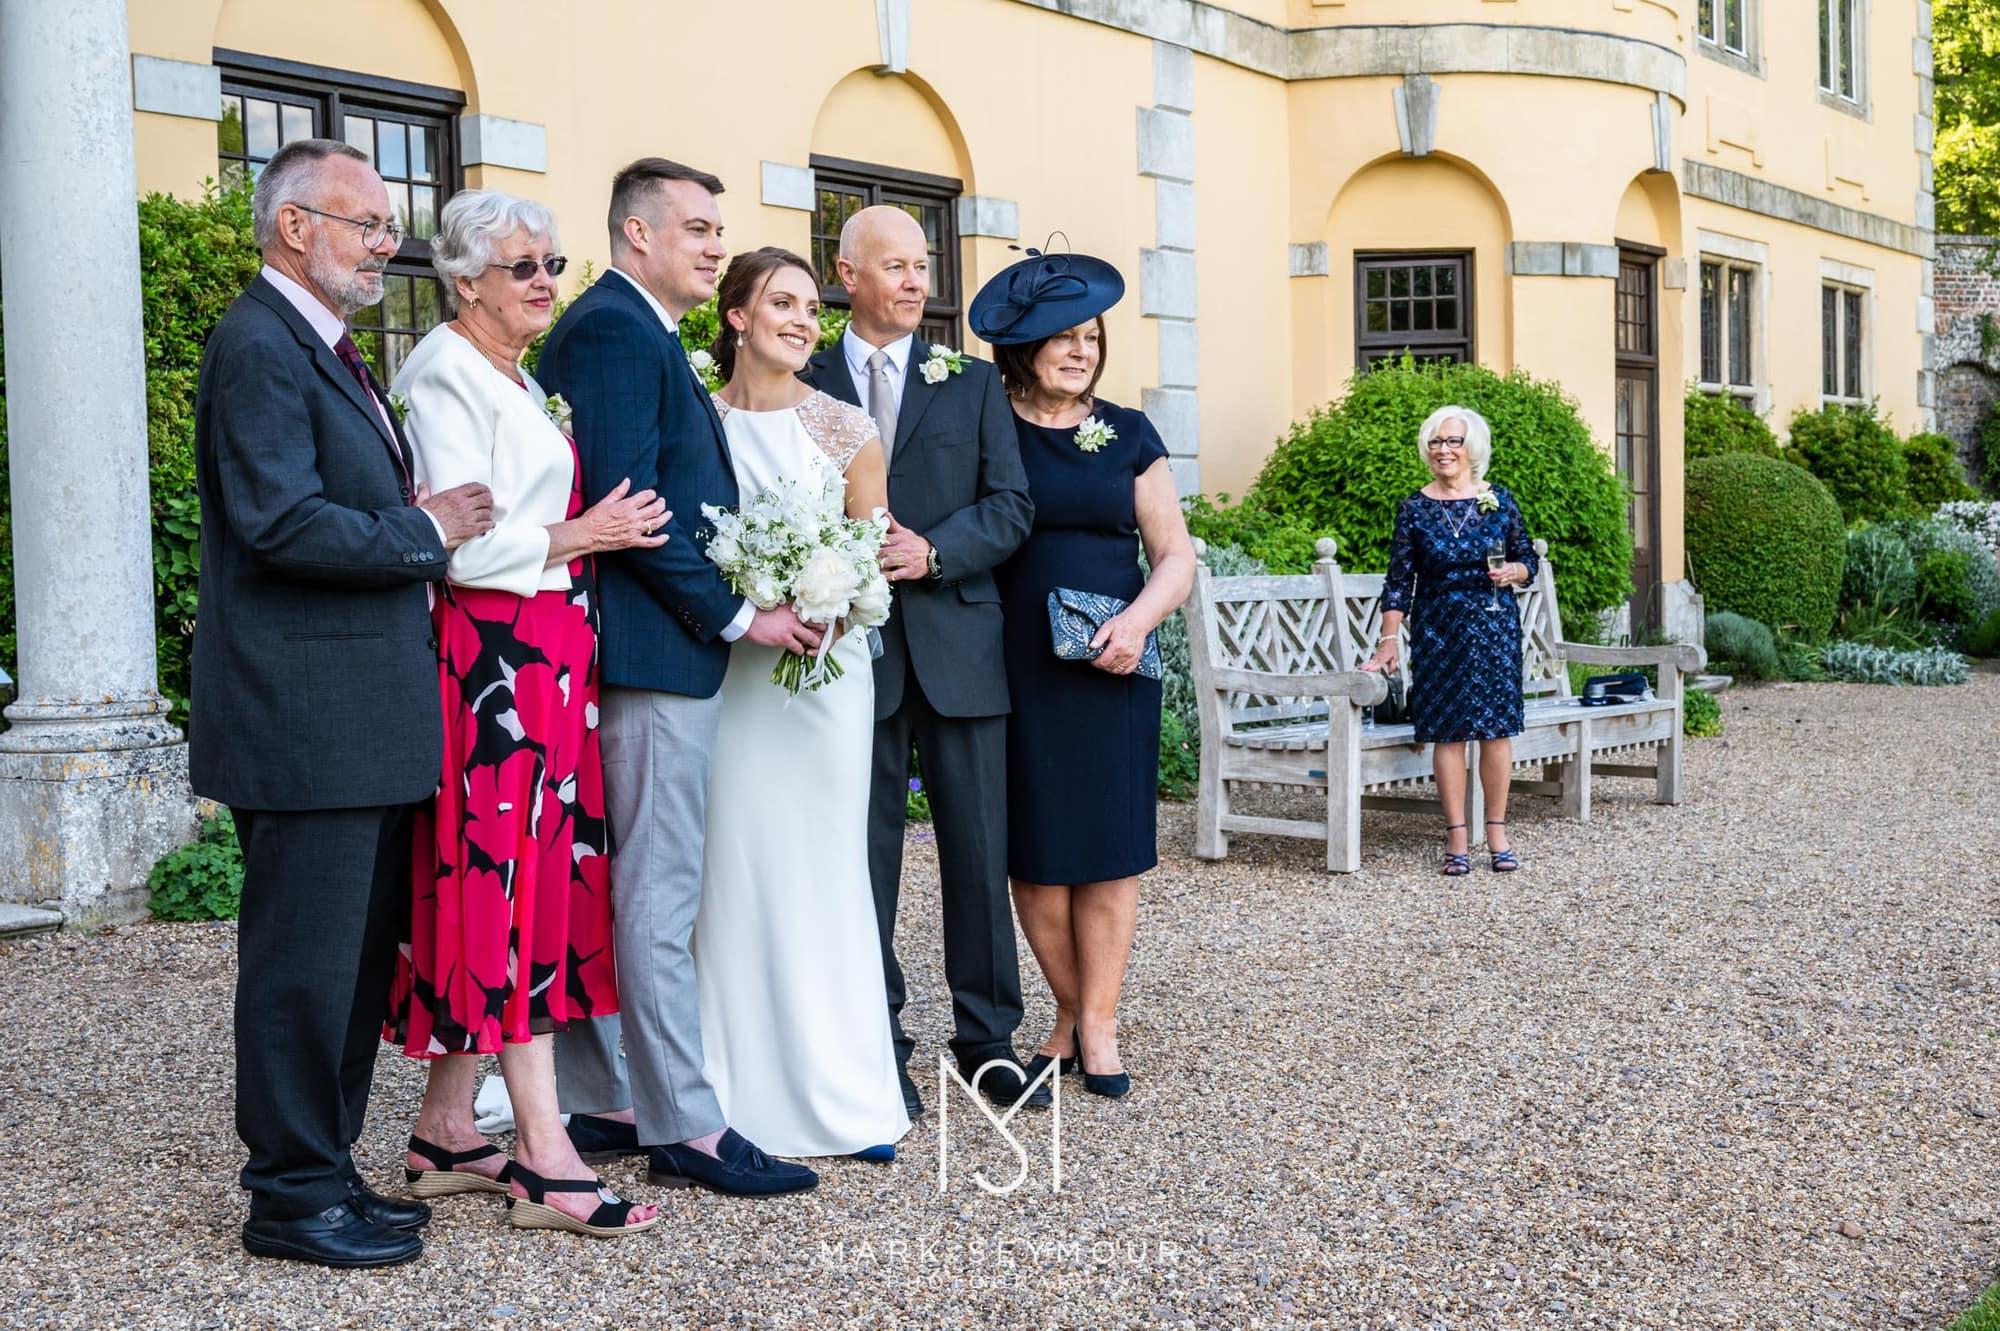 Hampden House Wedding Photography - Hannah and Lee's wedding. 14